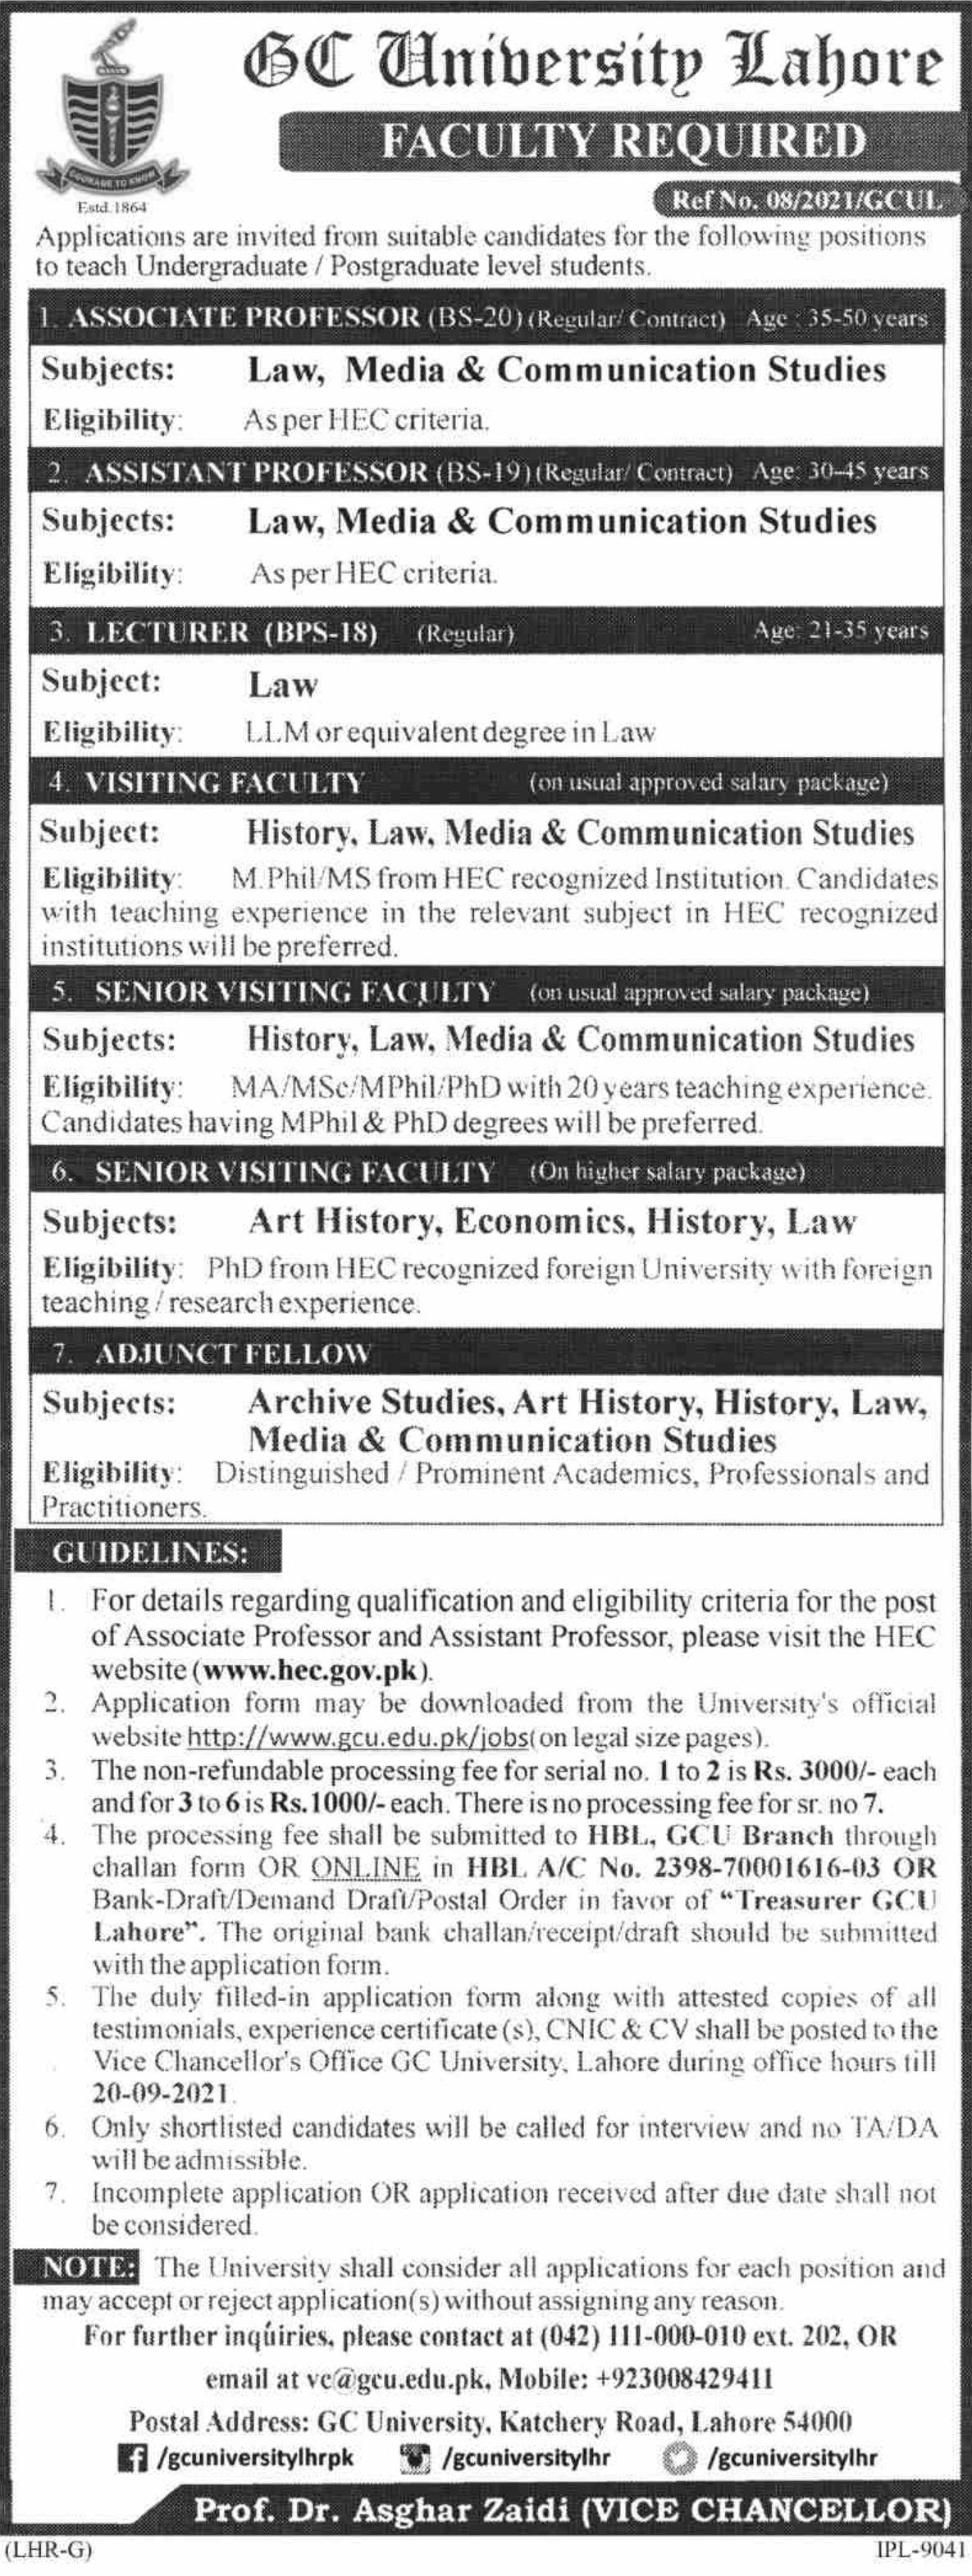 GC University Lahore Vacancies 2021 3